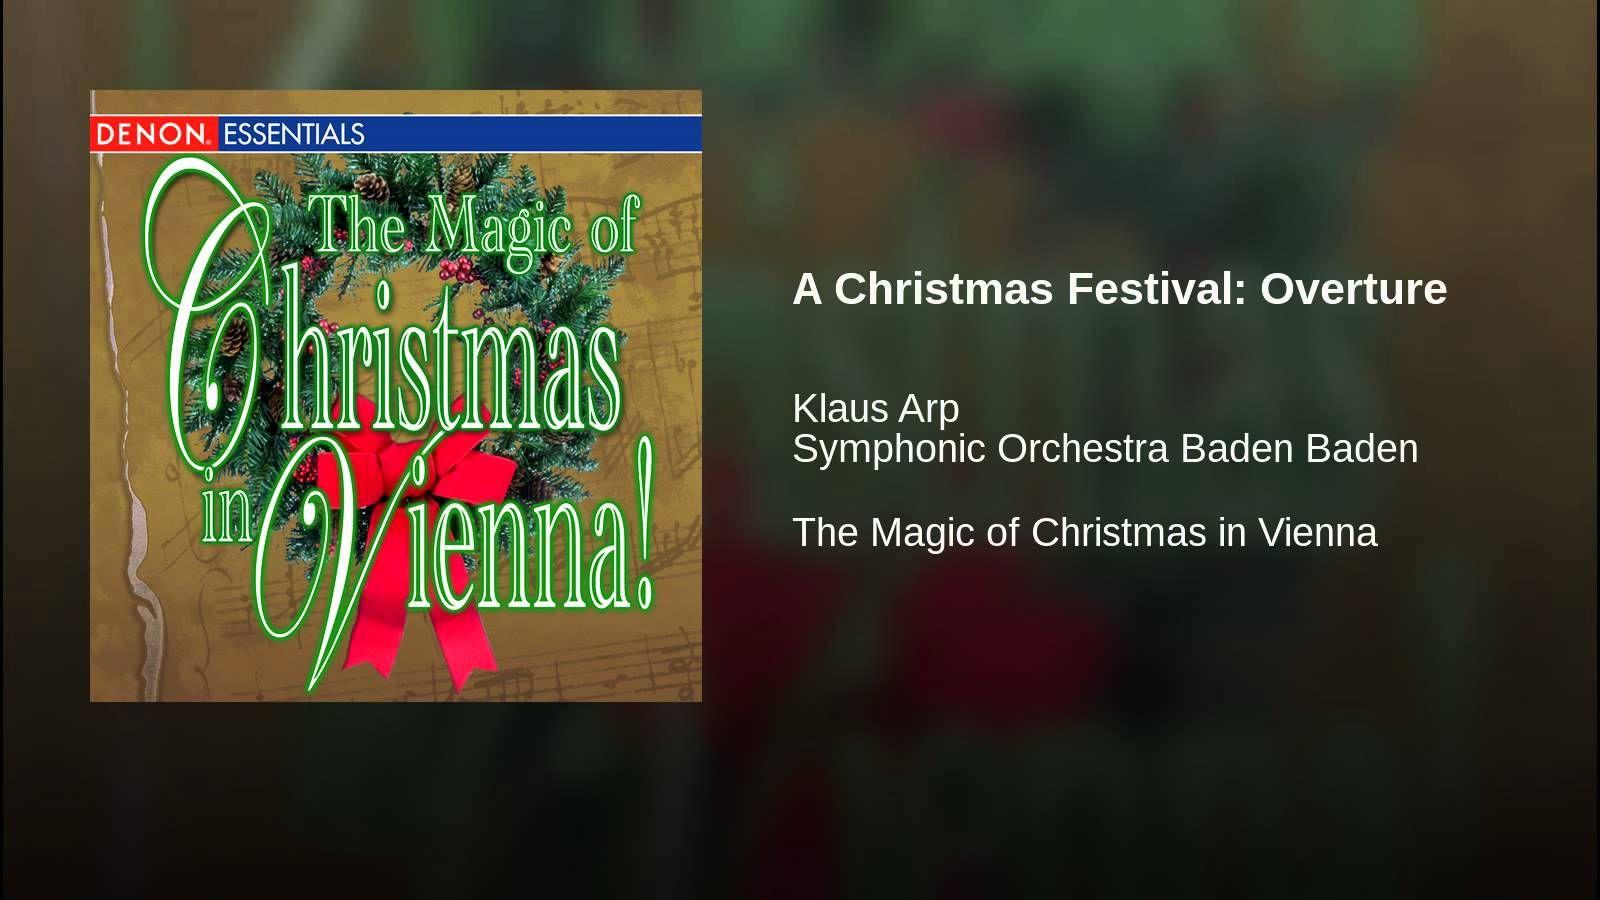 A Christmas Festival: Overture